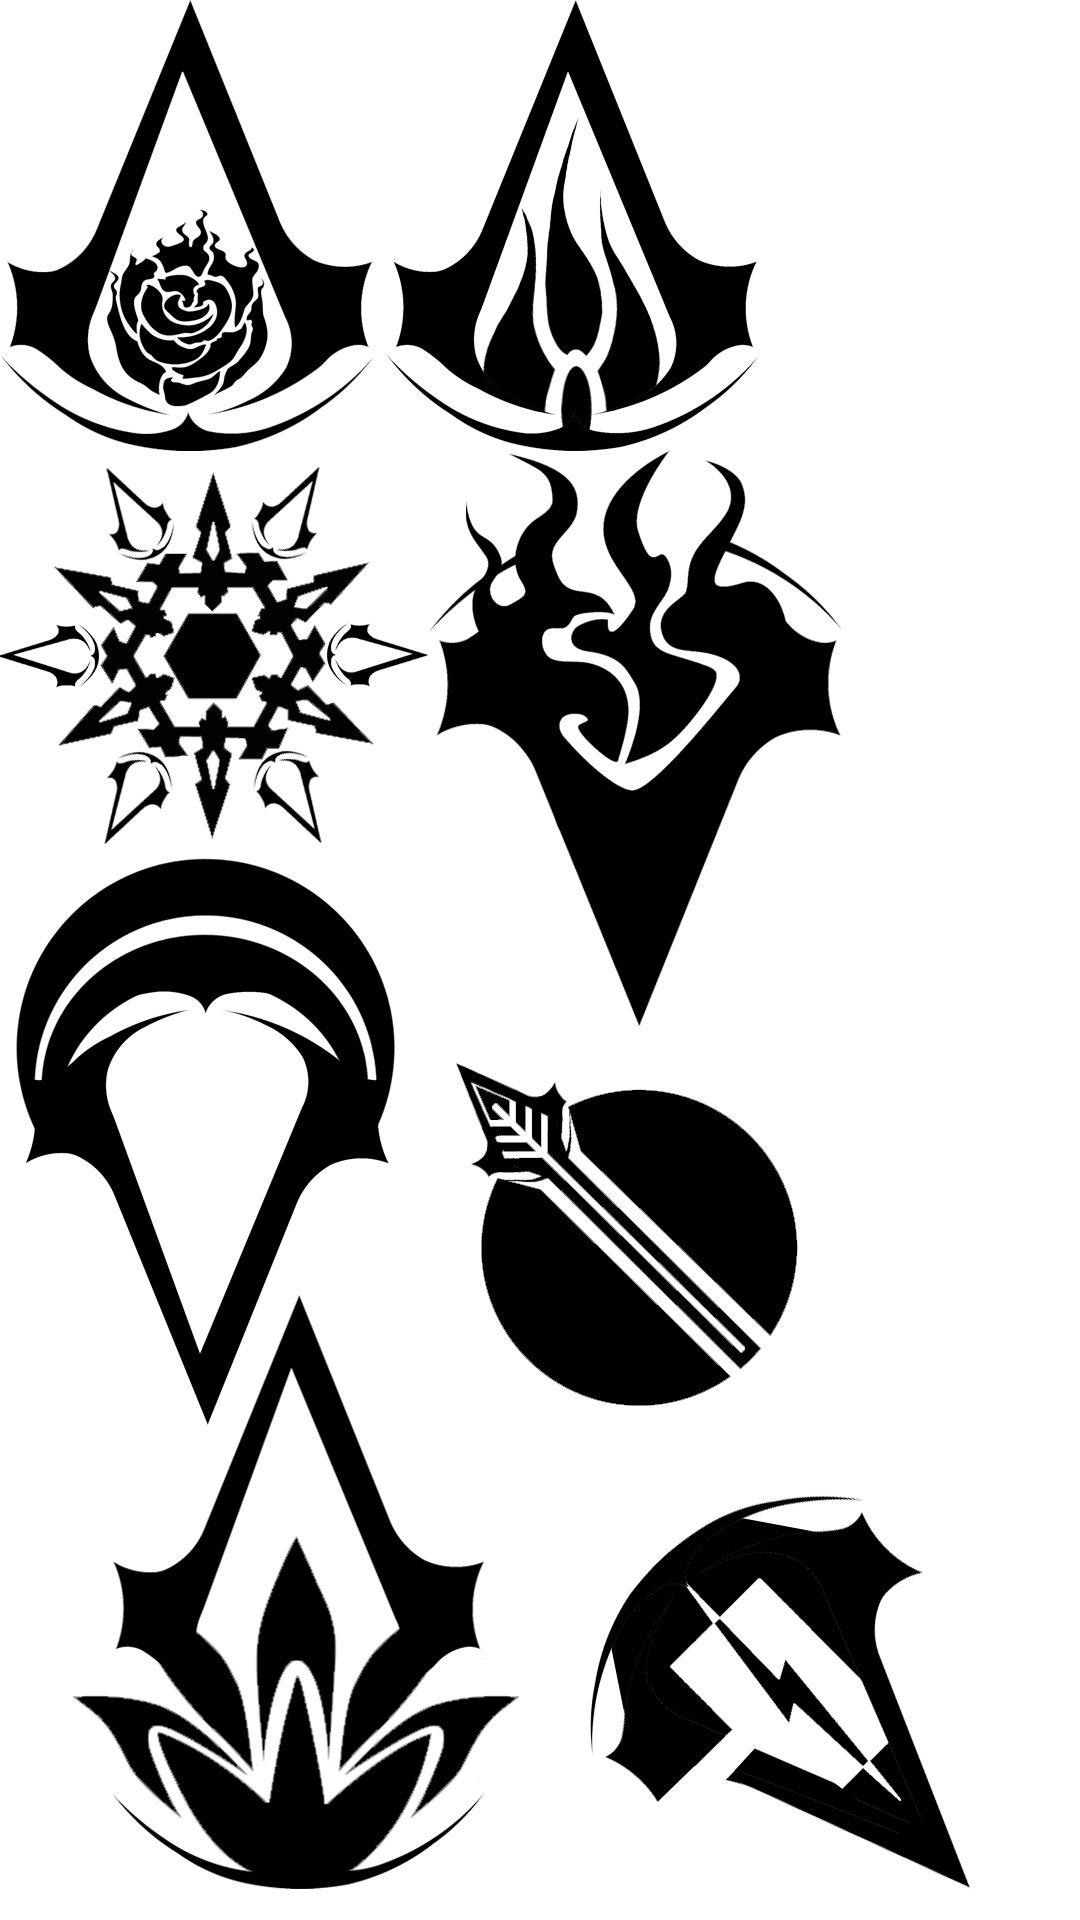 rwby_assassins_creed_symbols_by_shazarakkd8if6a2.jpg